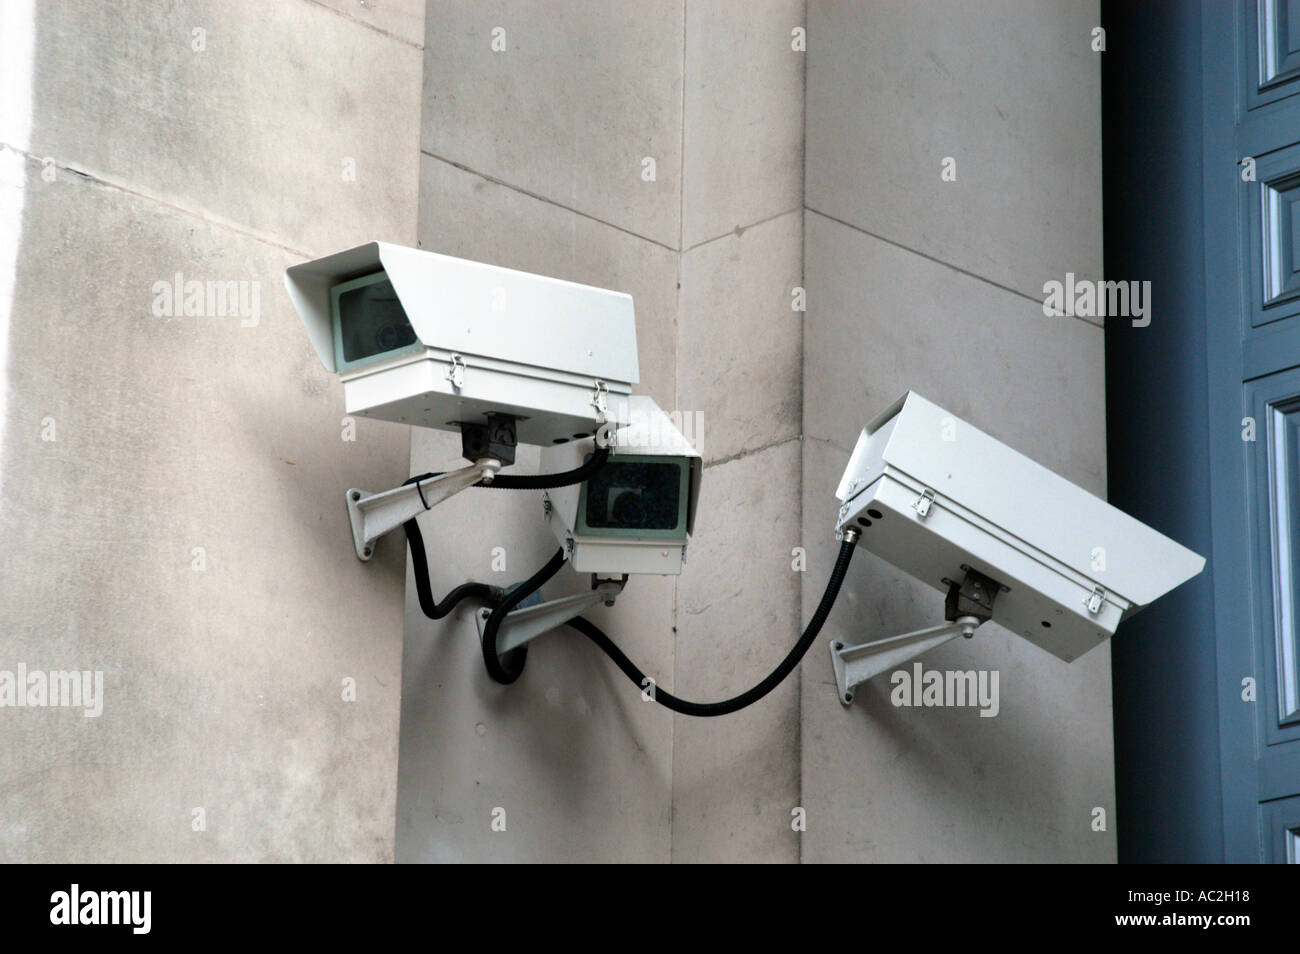 CCTV security cameras London England UK - Stock Image